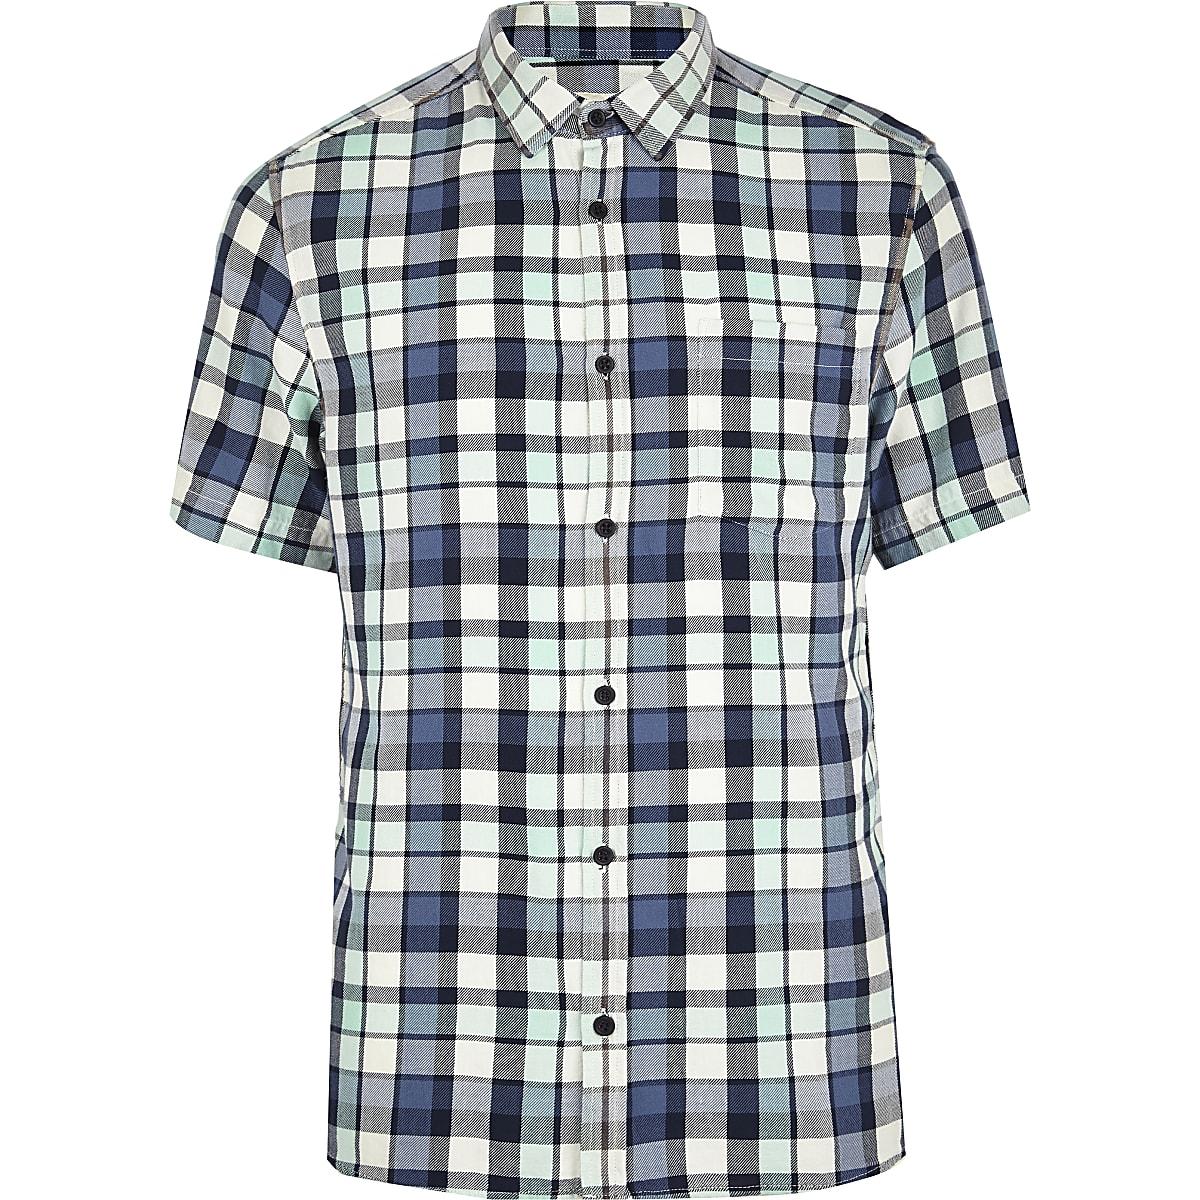 Black washed check short sleeve shirt